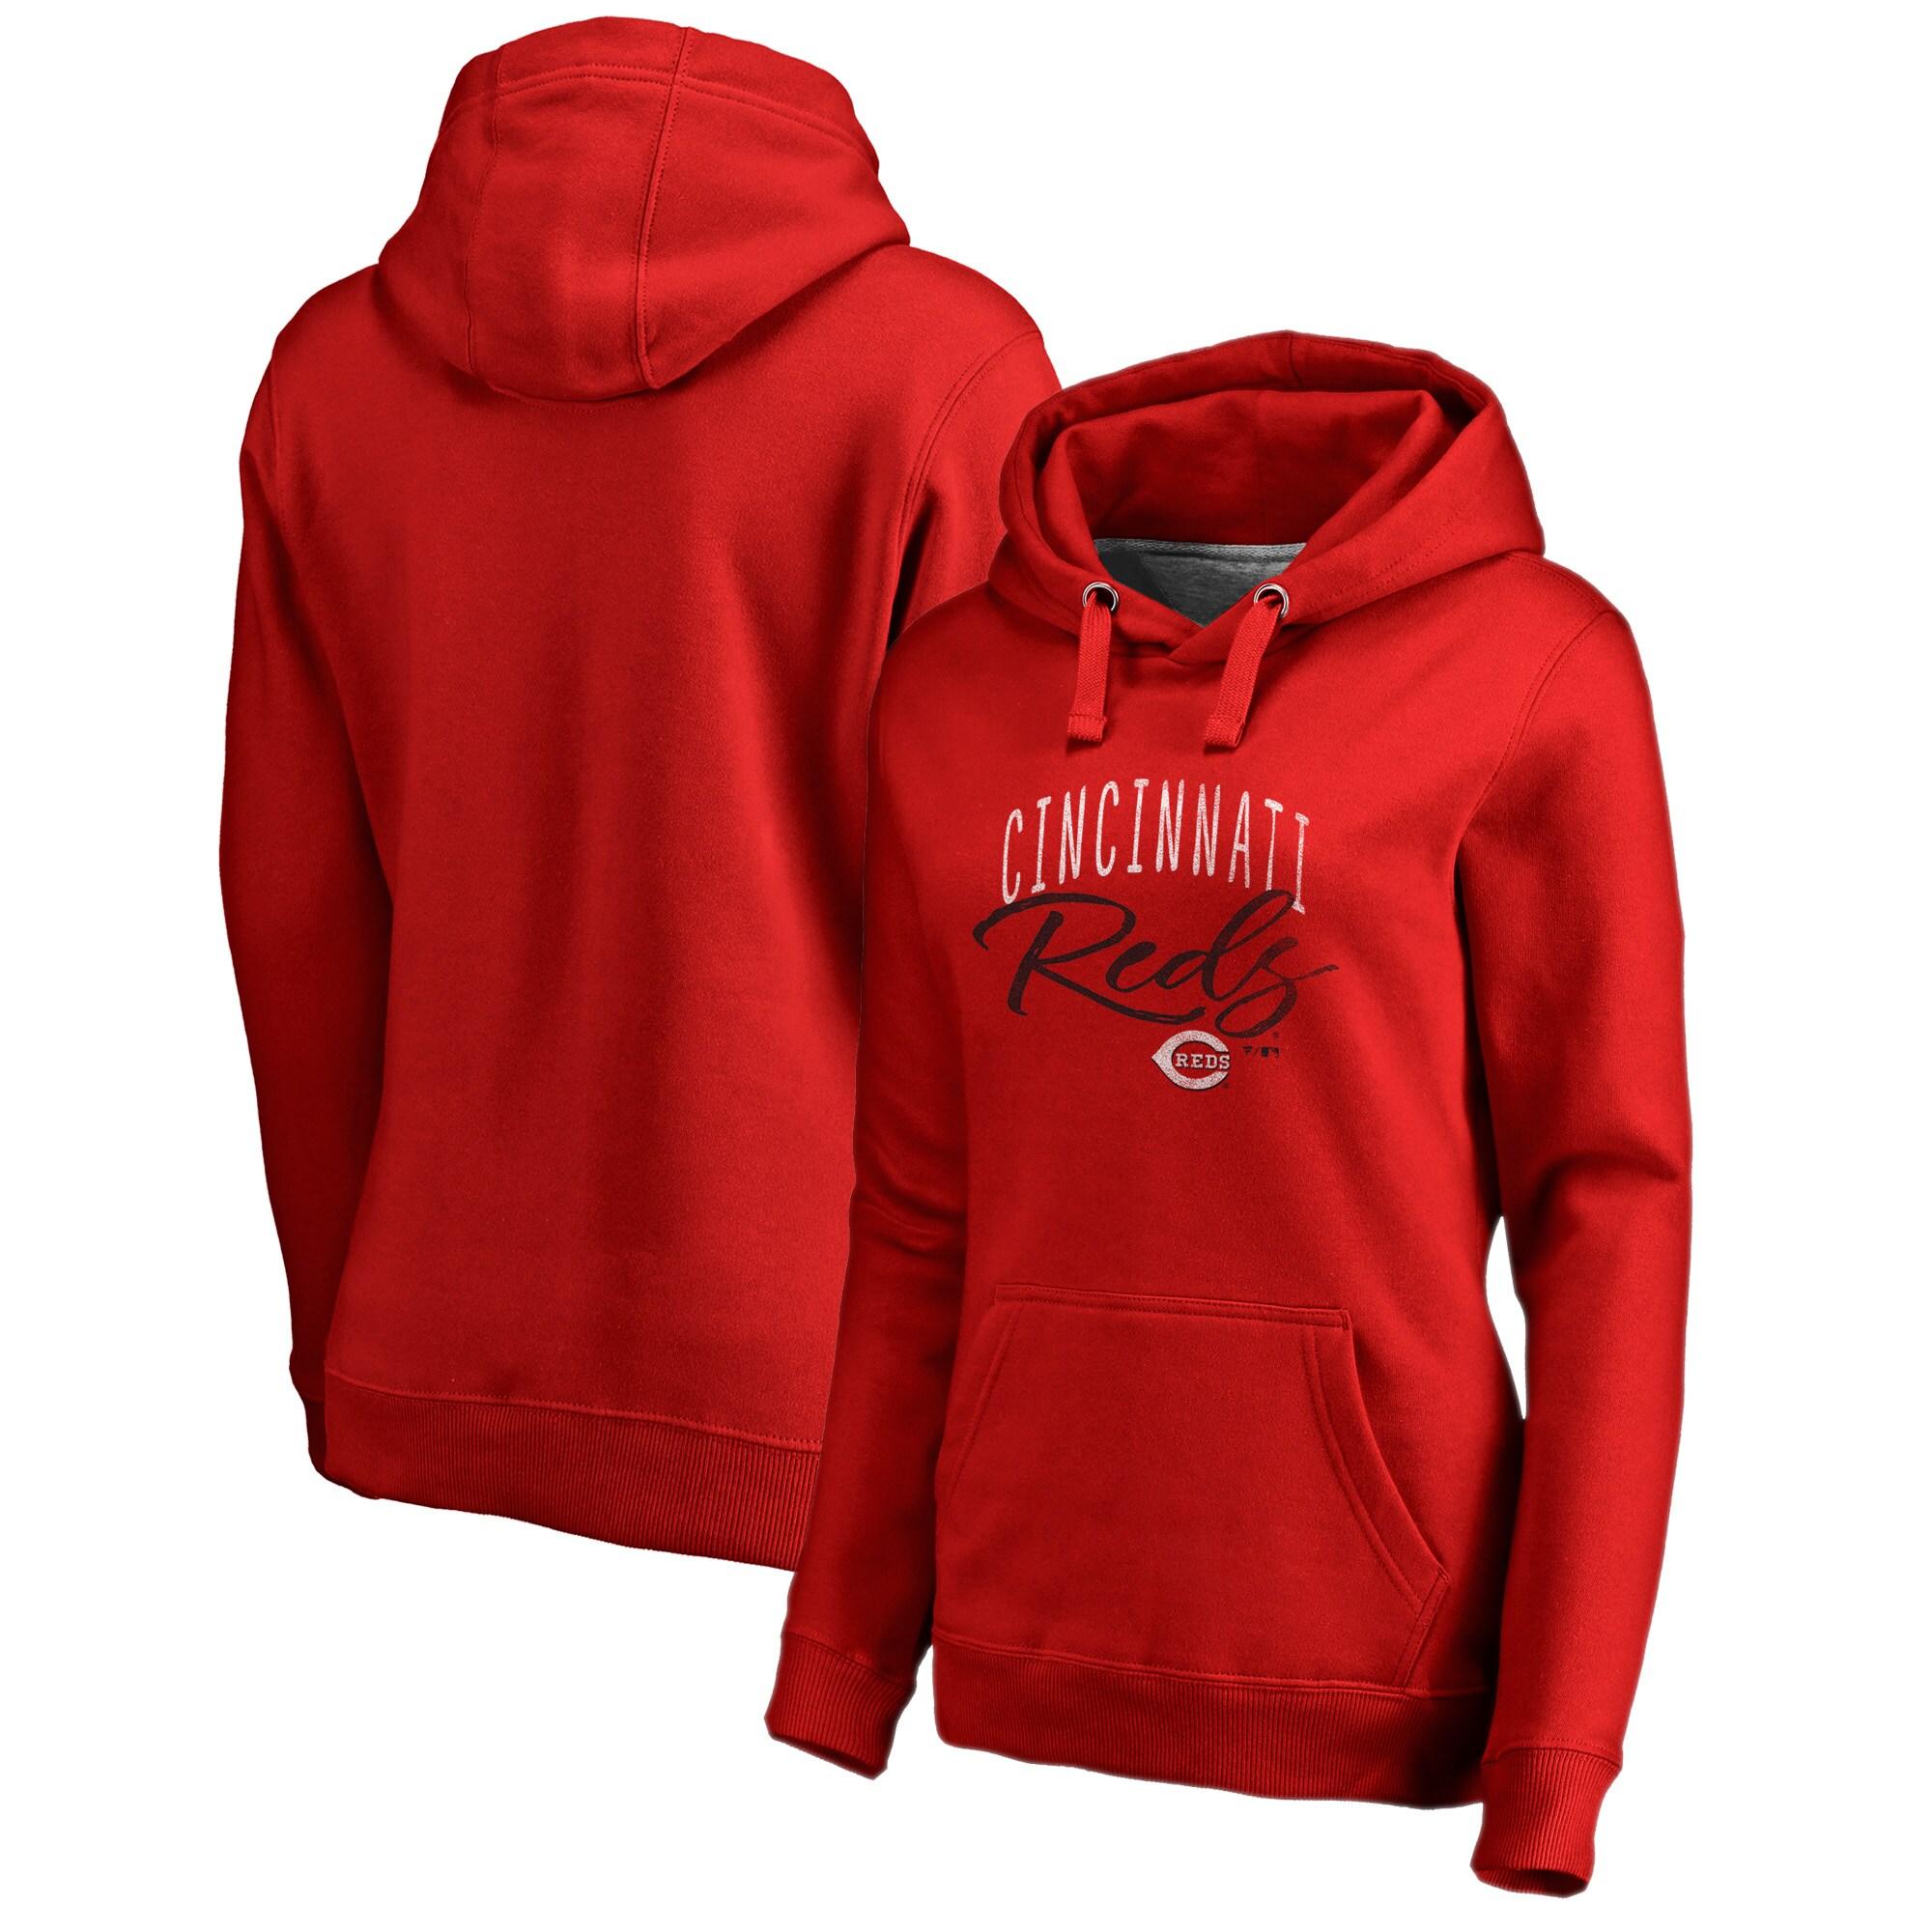 Cincinnati Reds Fanatics Branded Women's Plus Size Graceful Pullover Hoodie - Red